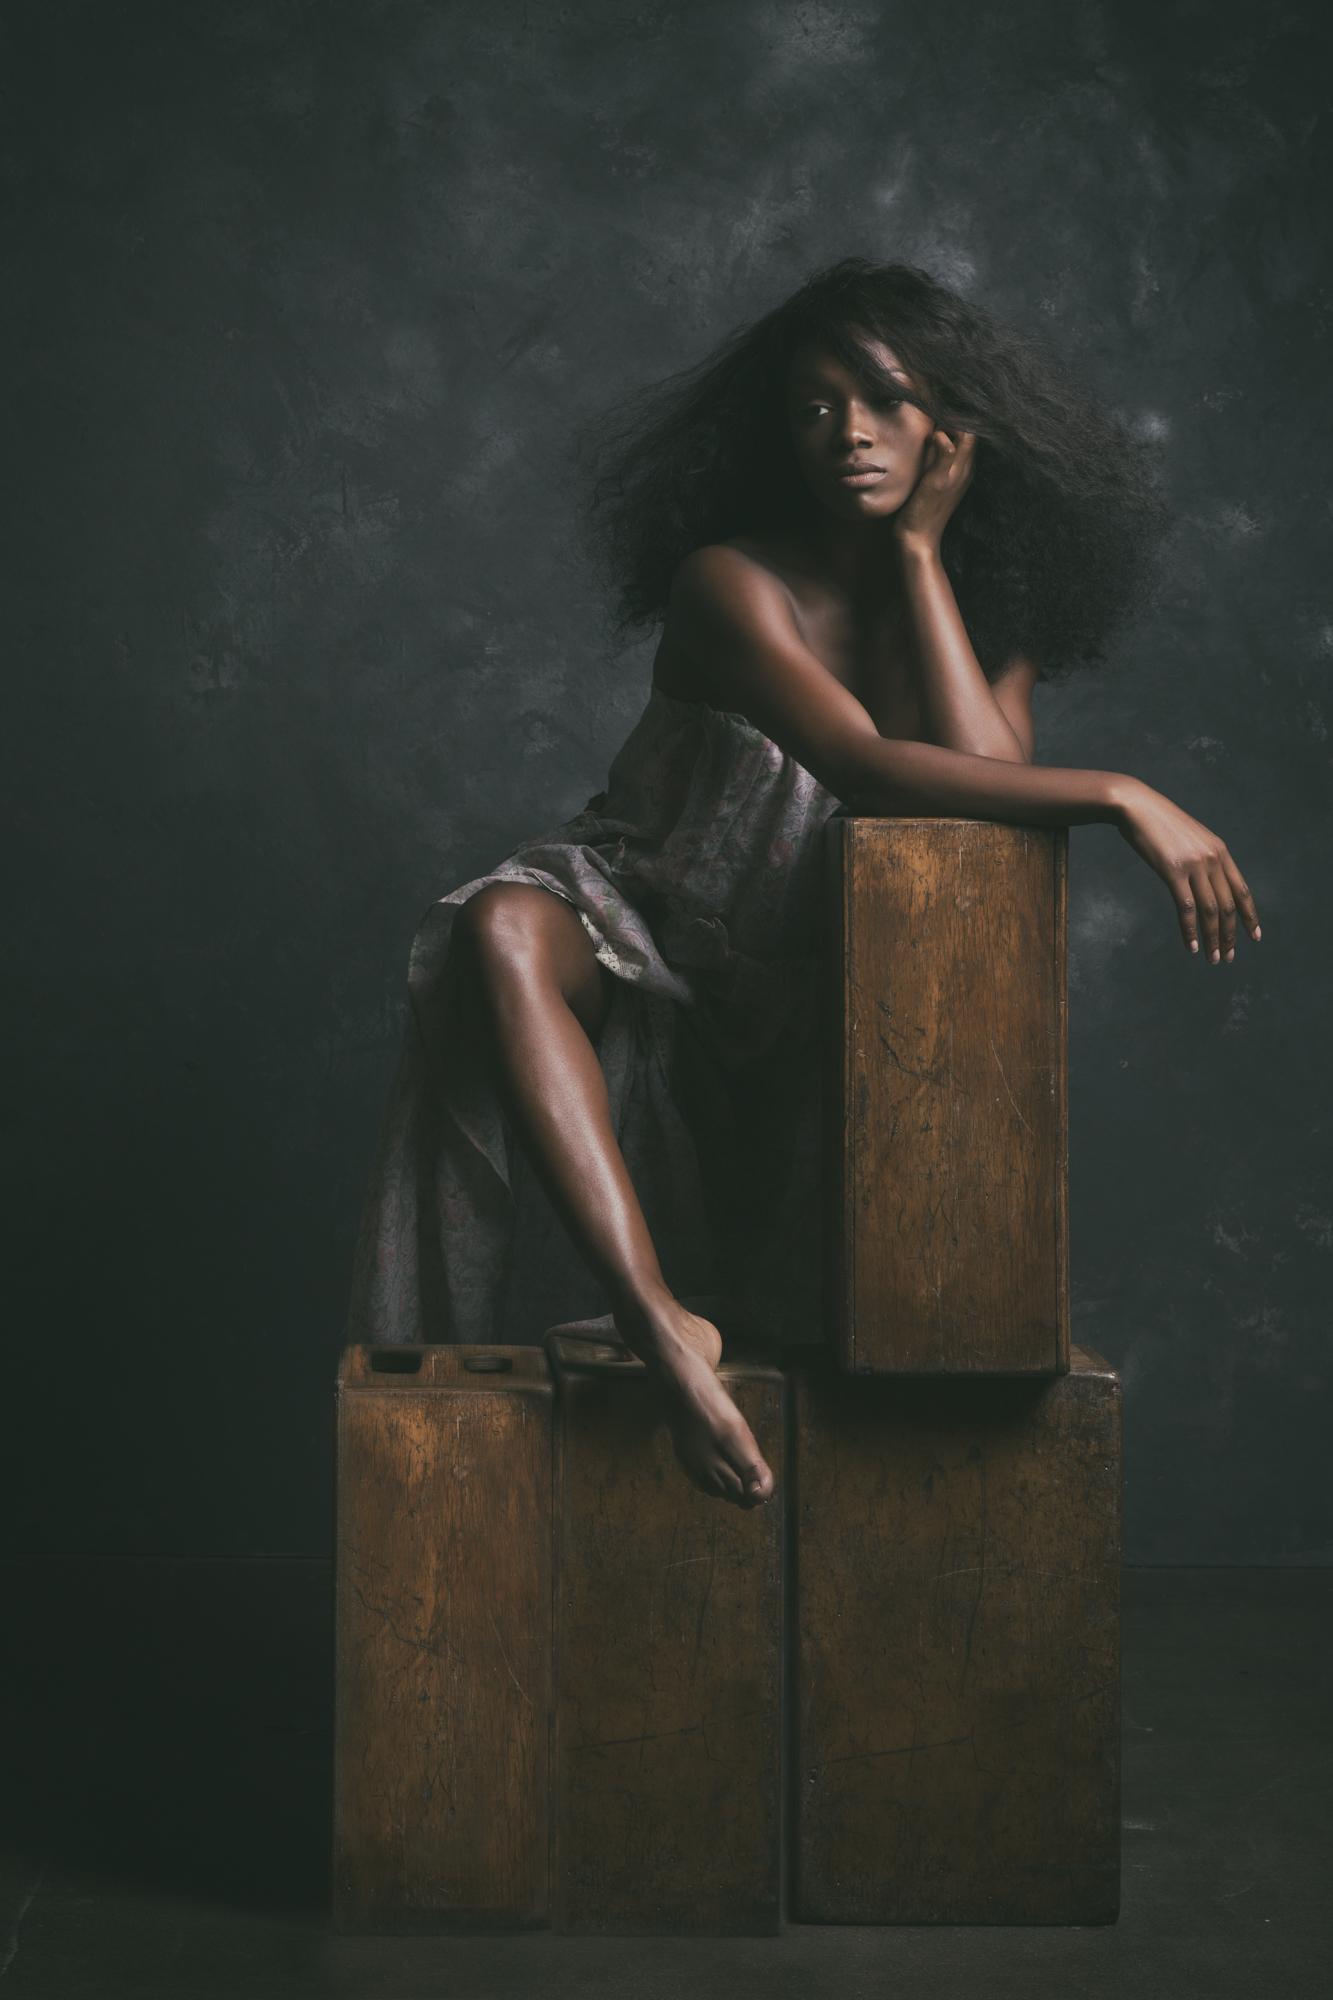 Luc-Richard Photography_Portraits_Editorial_Luc-Richard Elie -2.jpg